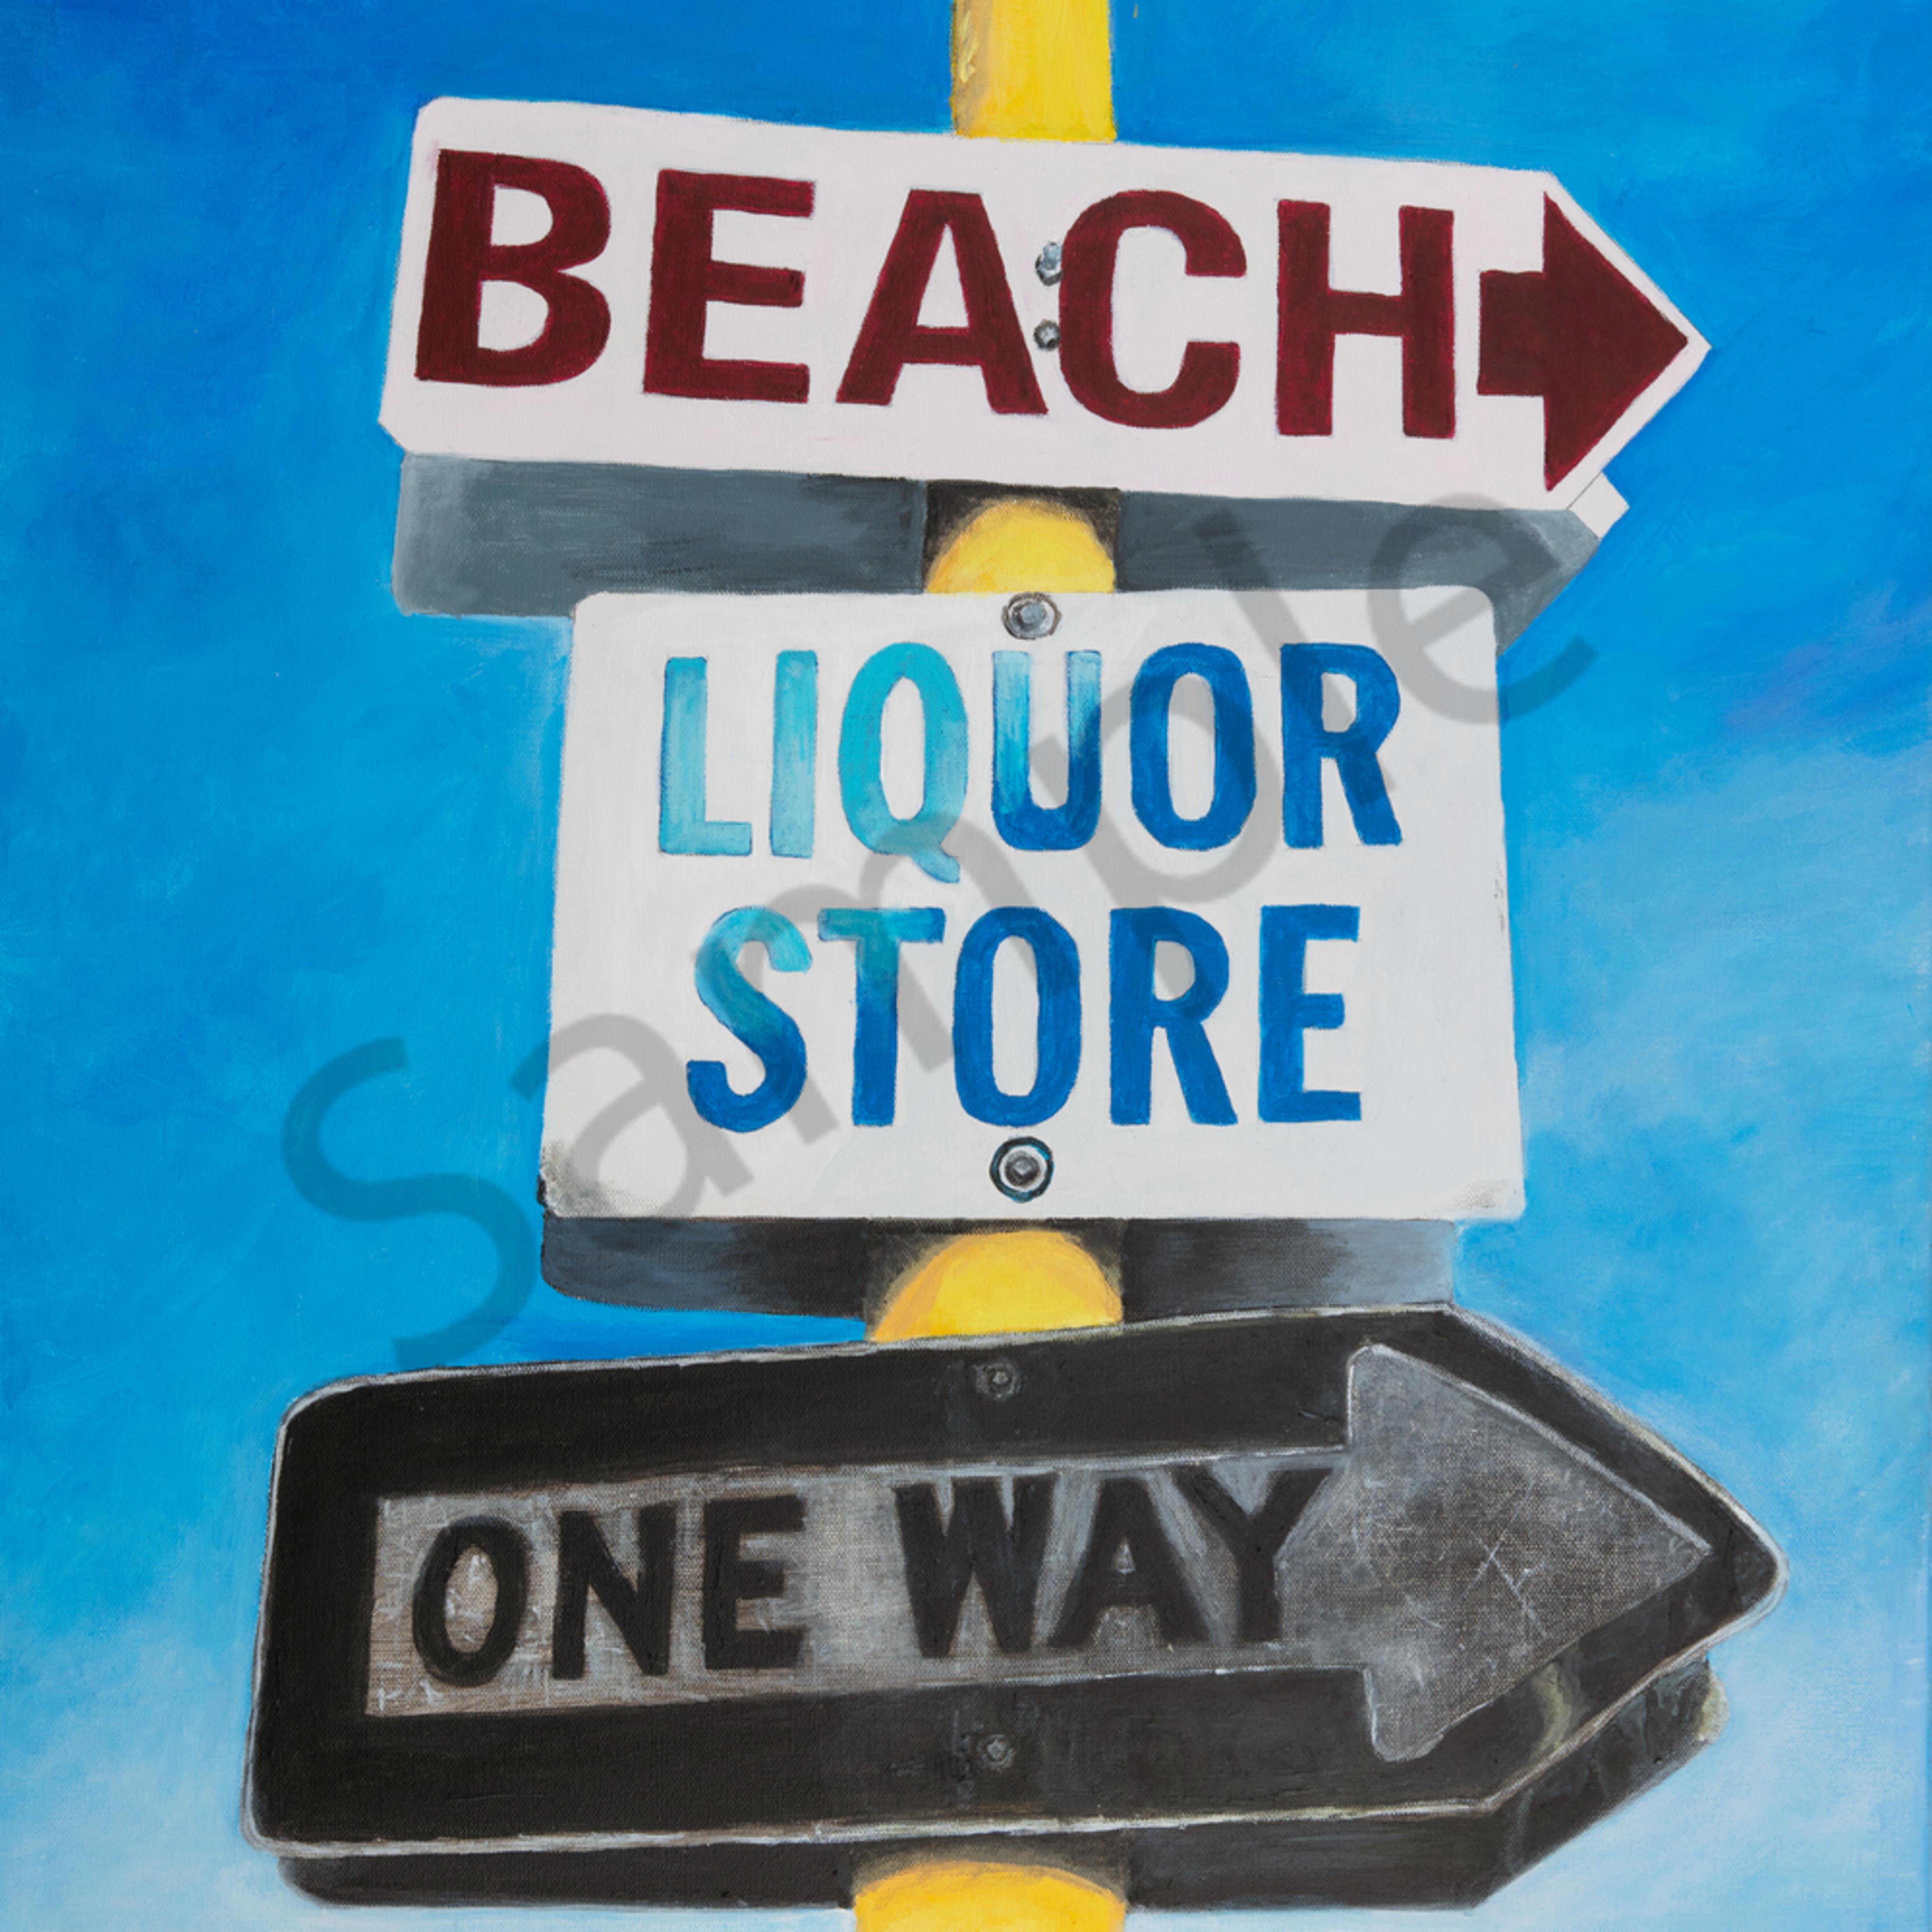 Beach liquor tovvdw